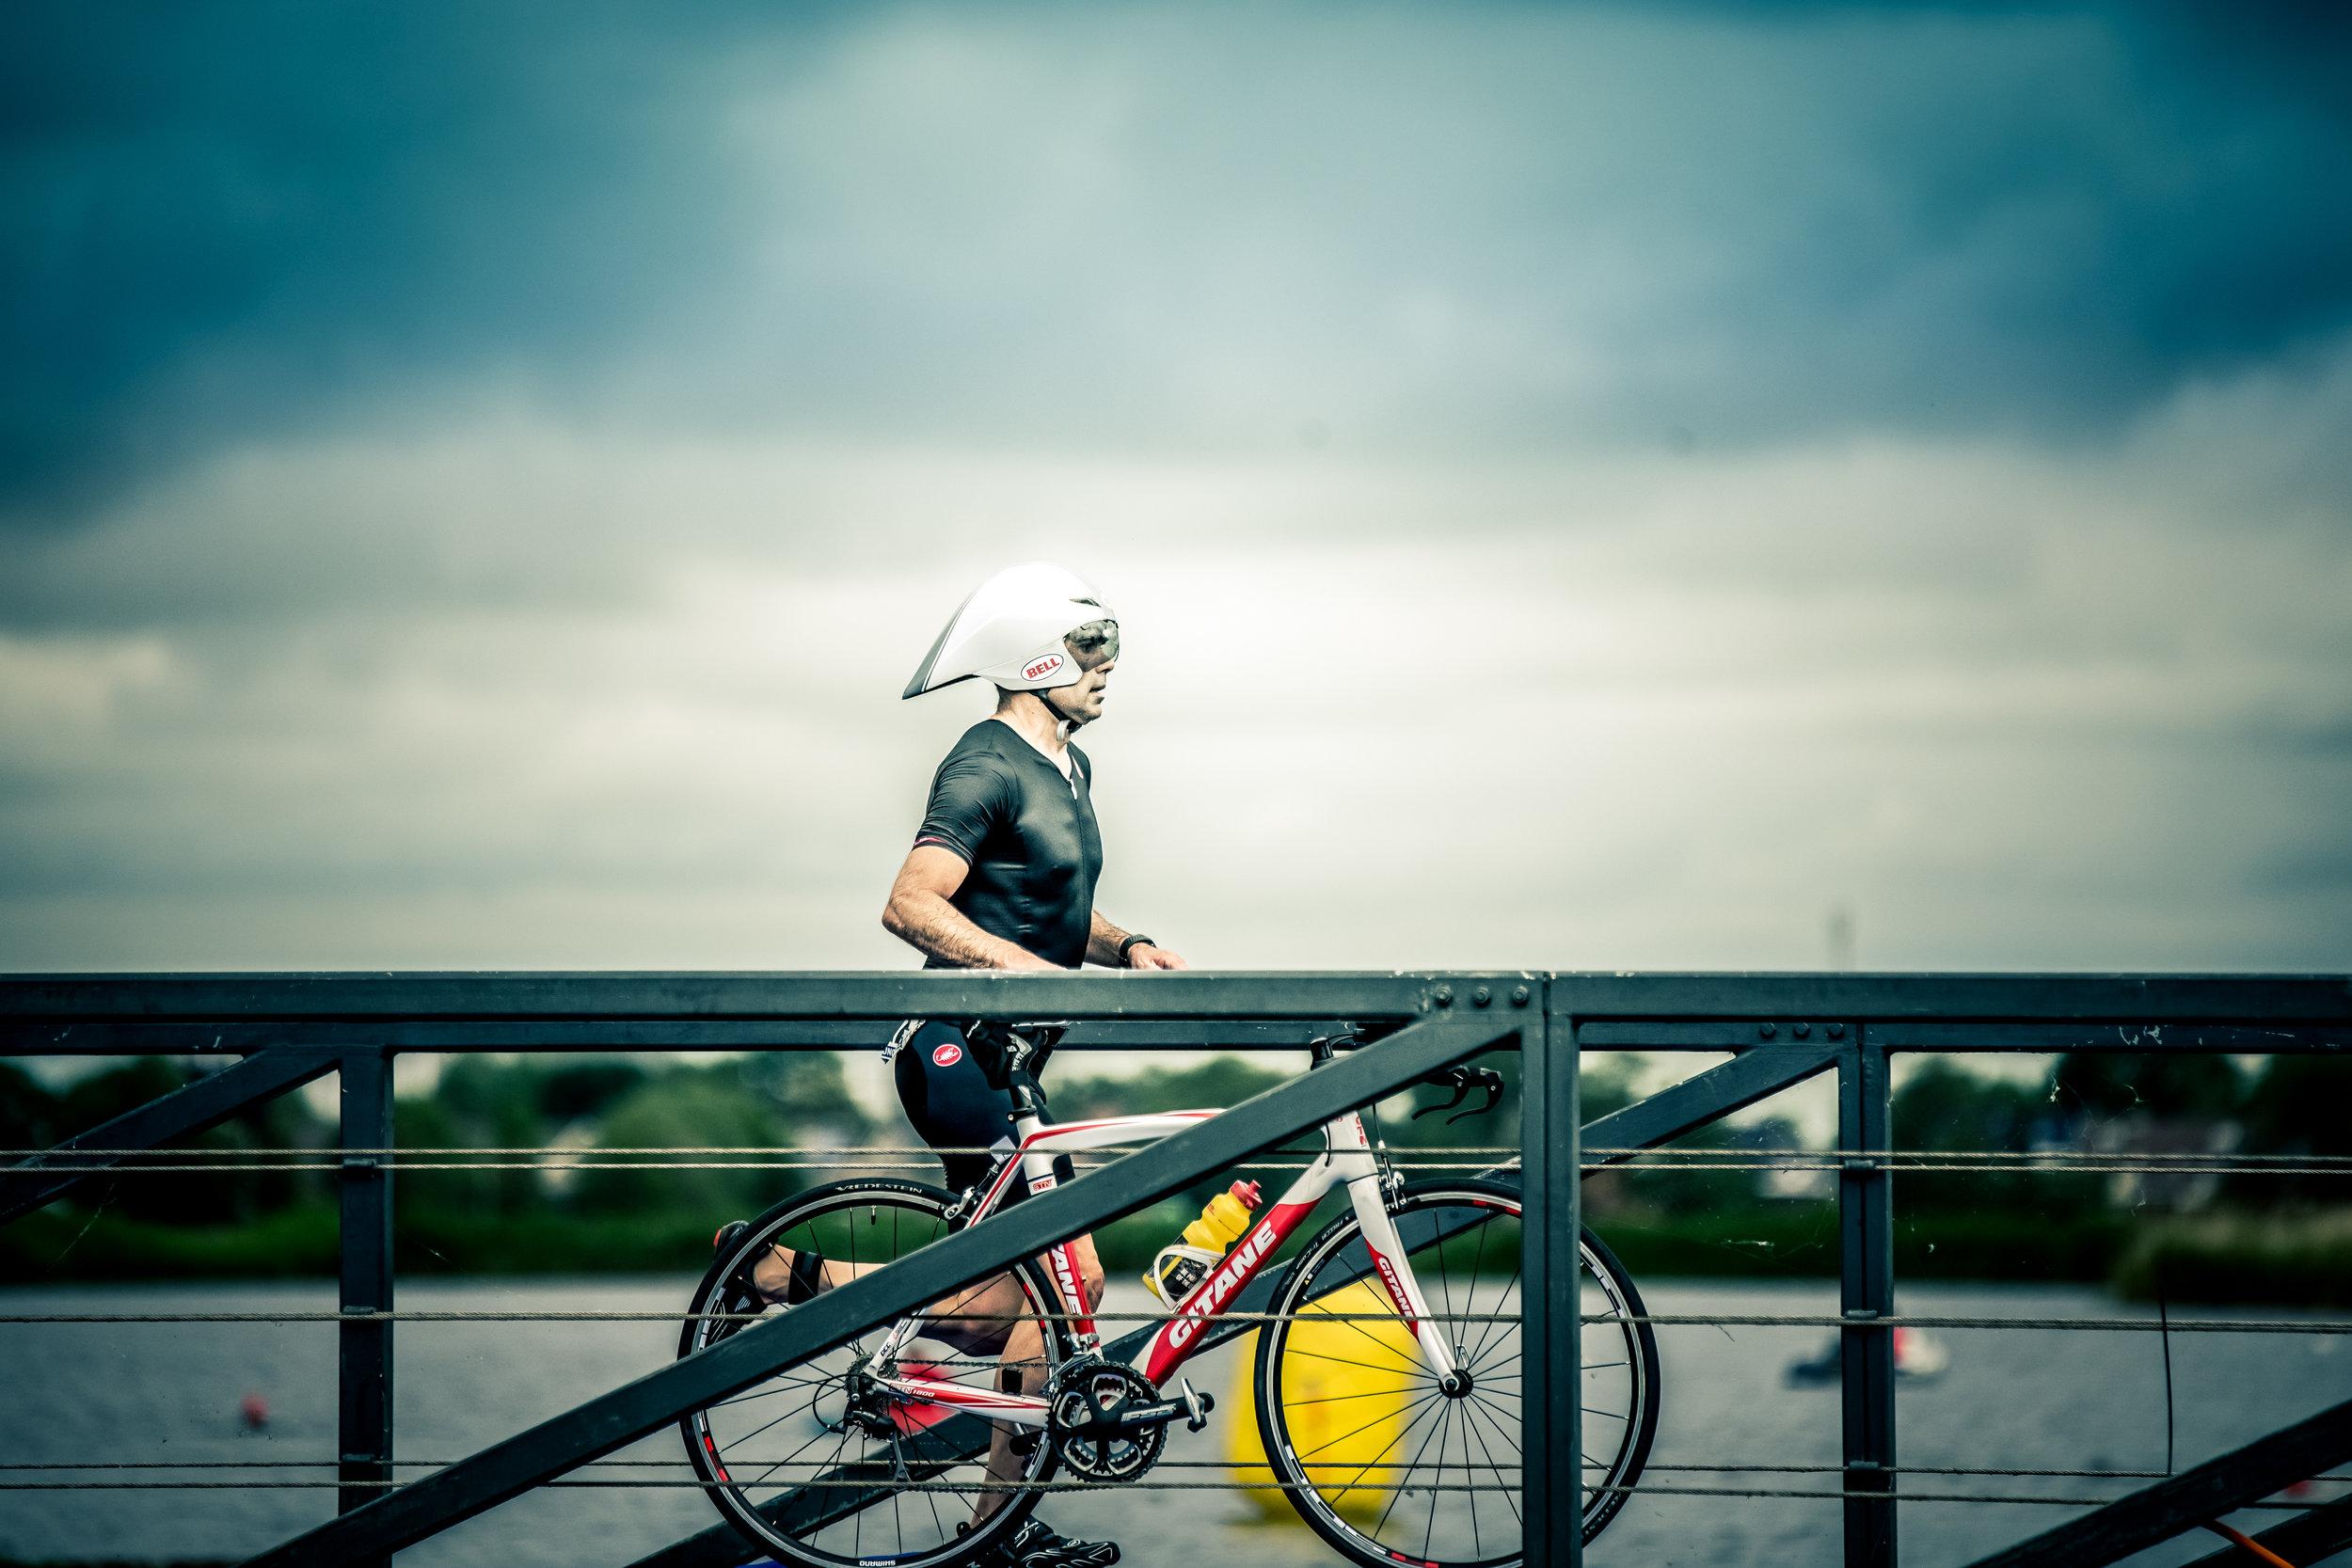 Olympic distance Clafis triathlon Oranjewoud/Heerenveen 2019